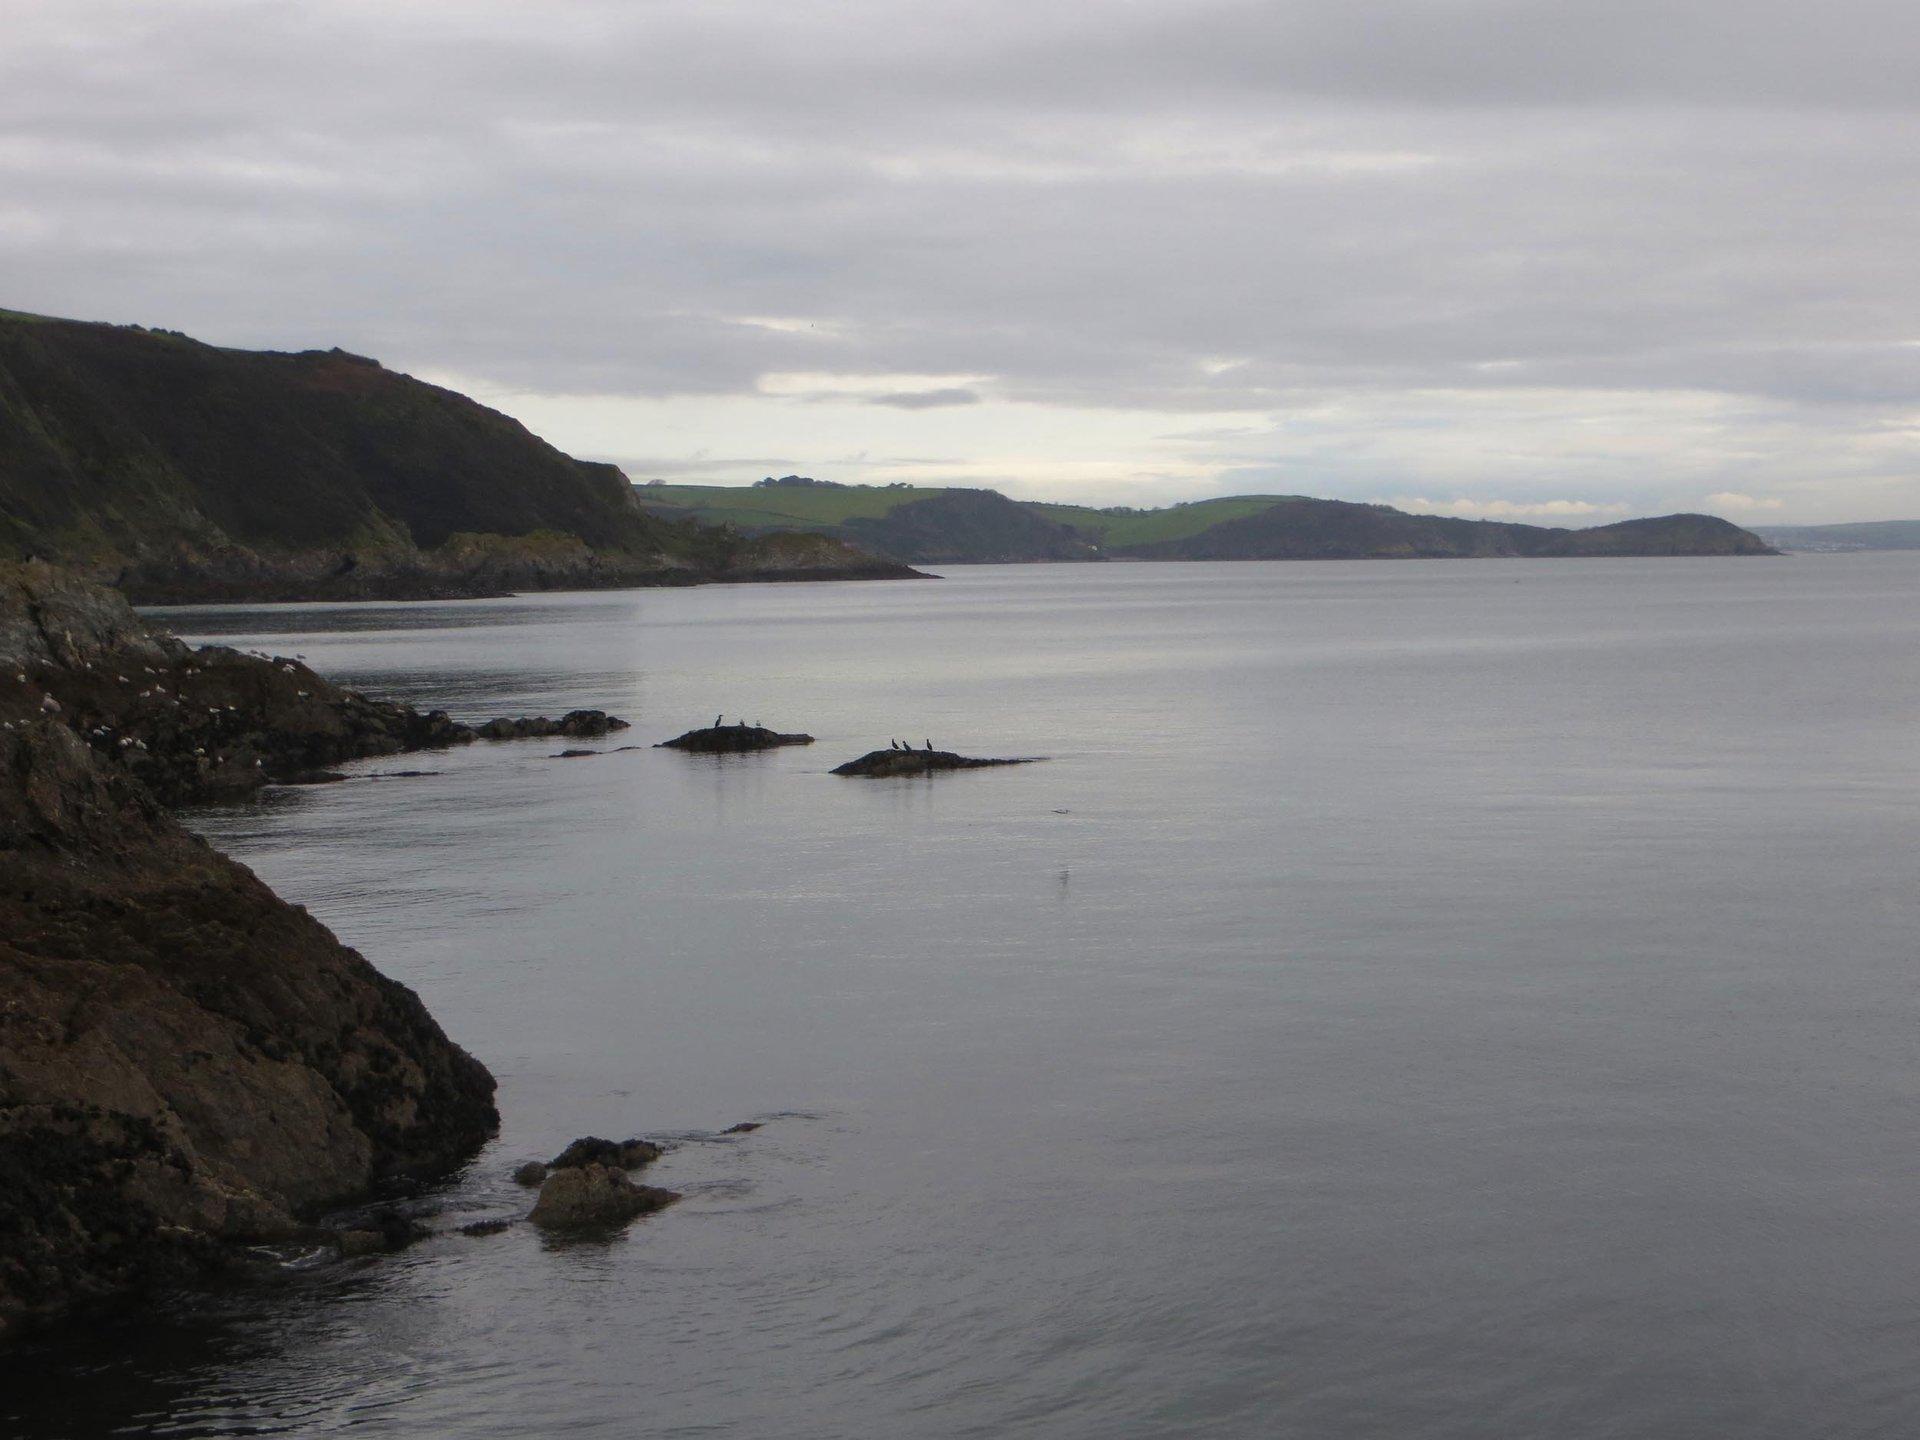 towards Pentewan from Mevagissey quayside L A Kent Rogue Flamingo DI Treloar mysteries